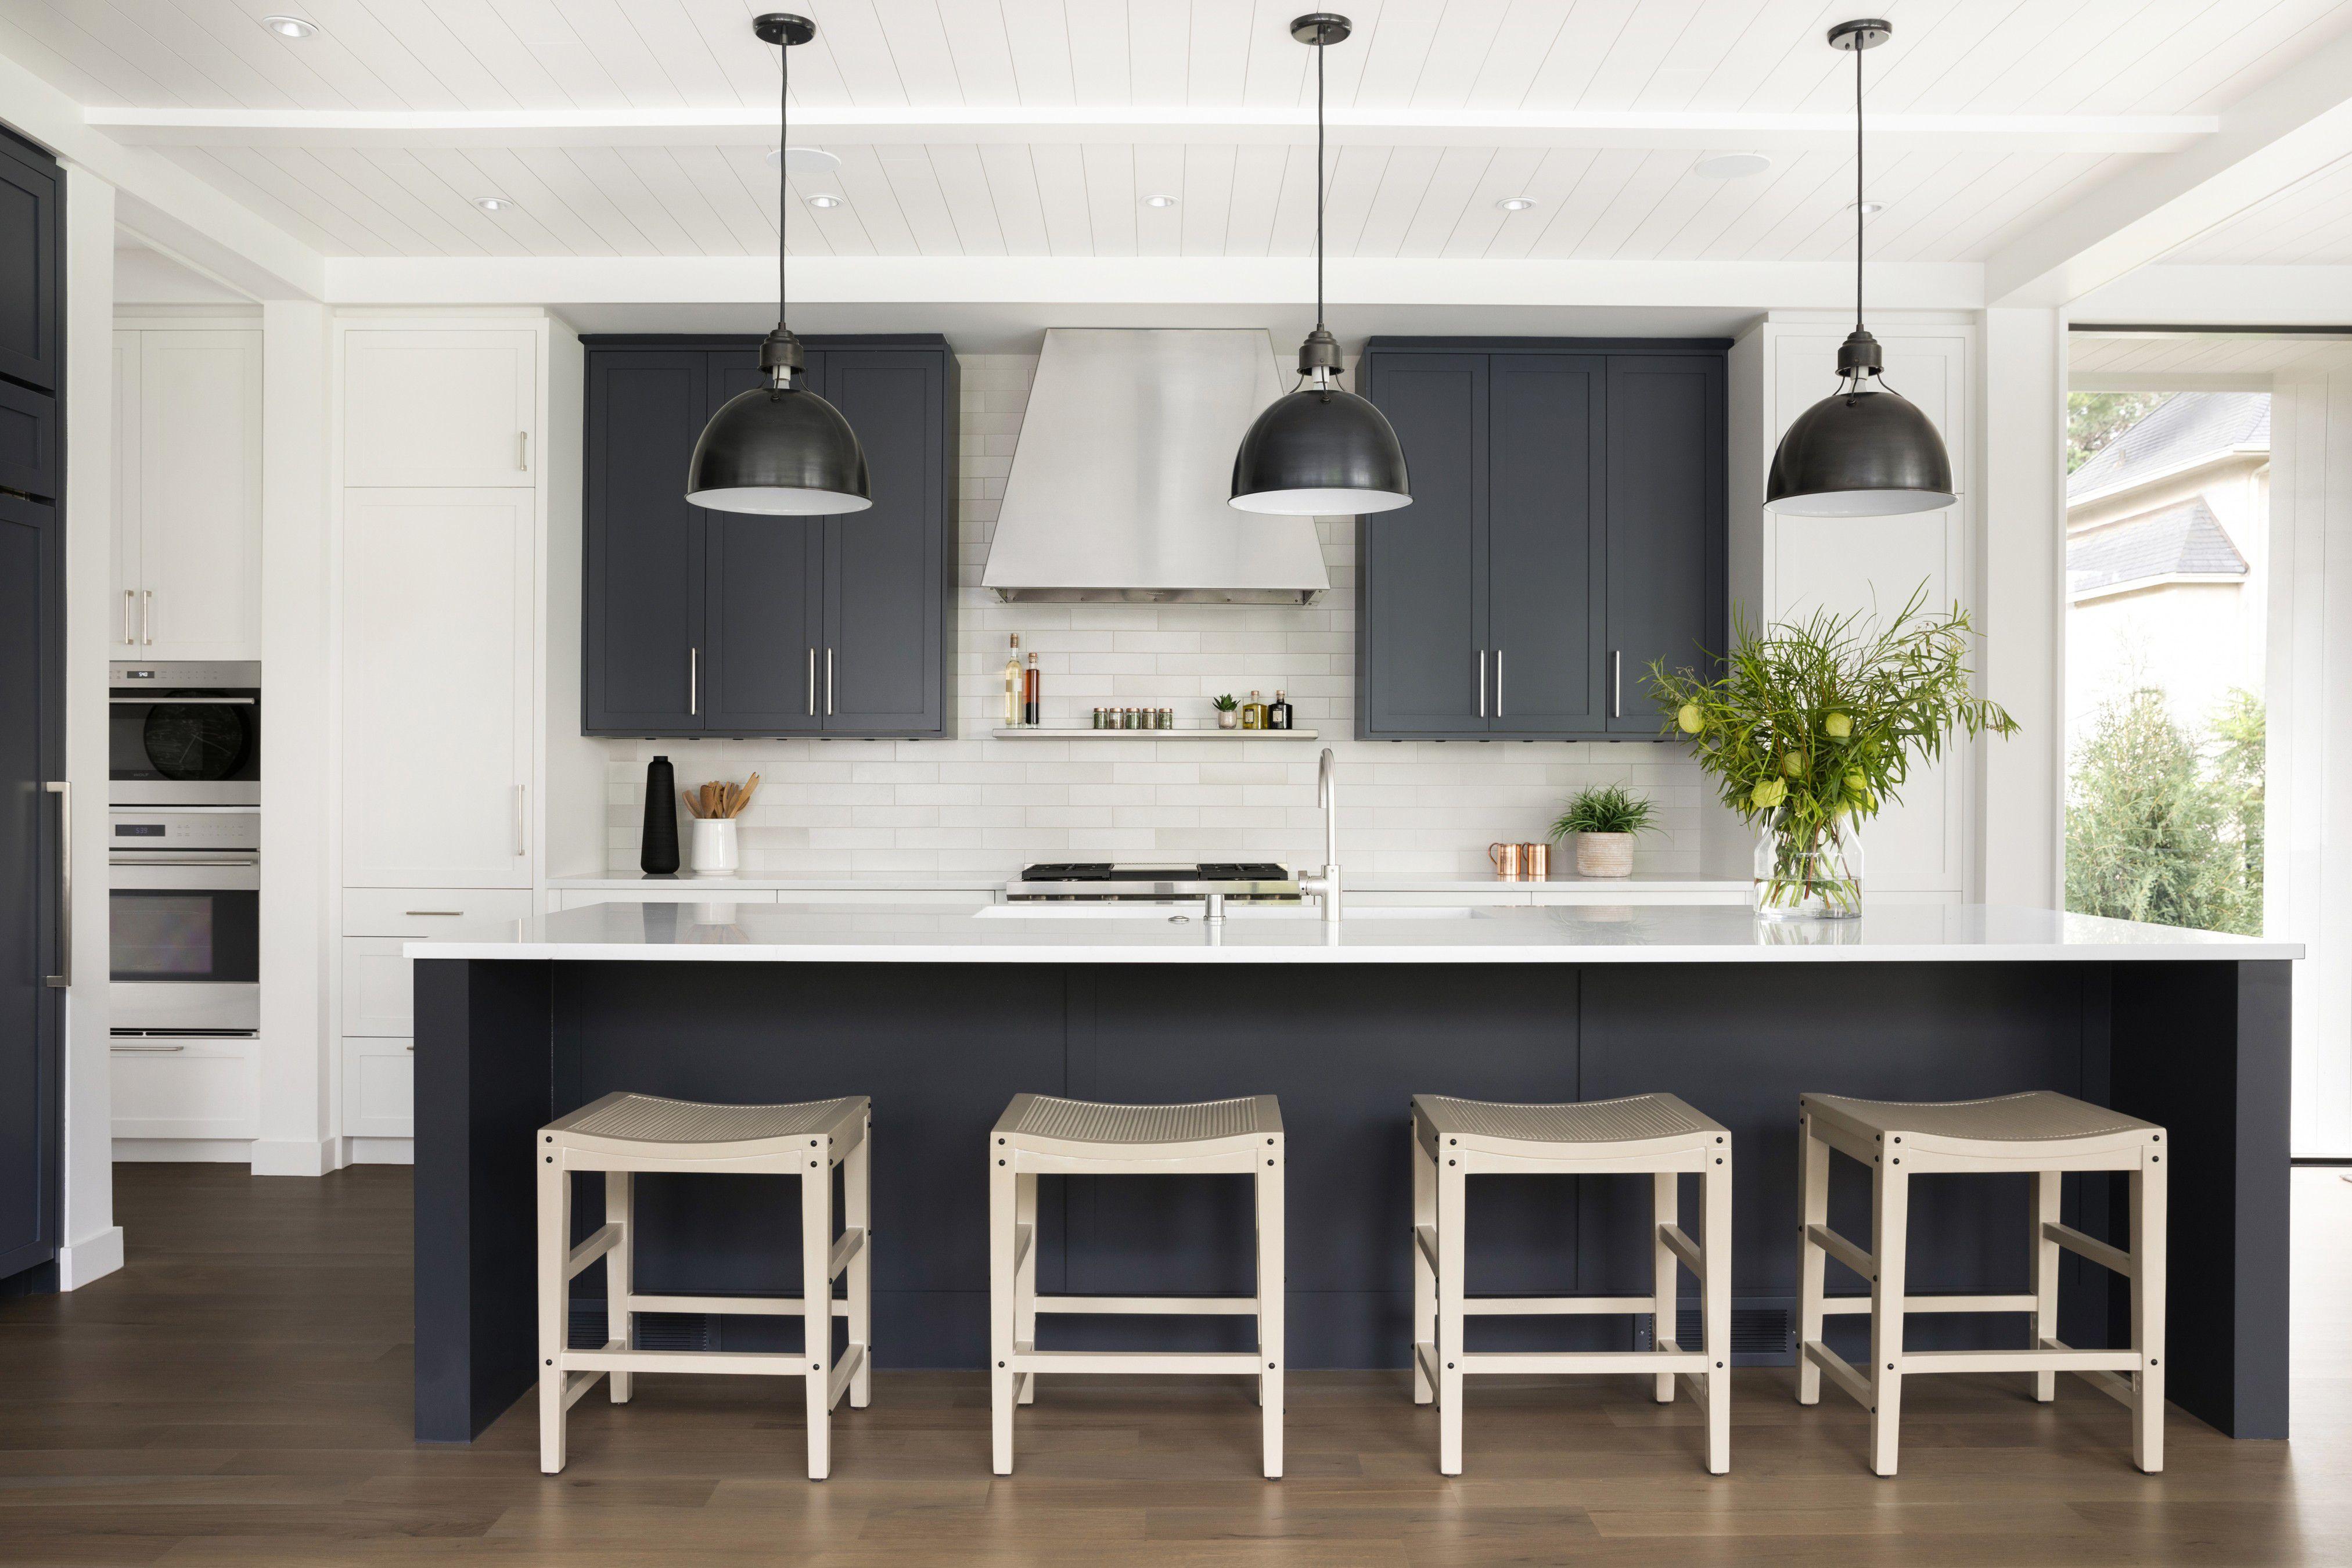 gabinetes de cocina negro mate